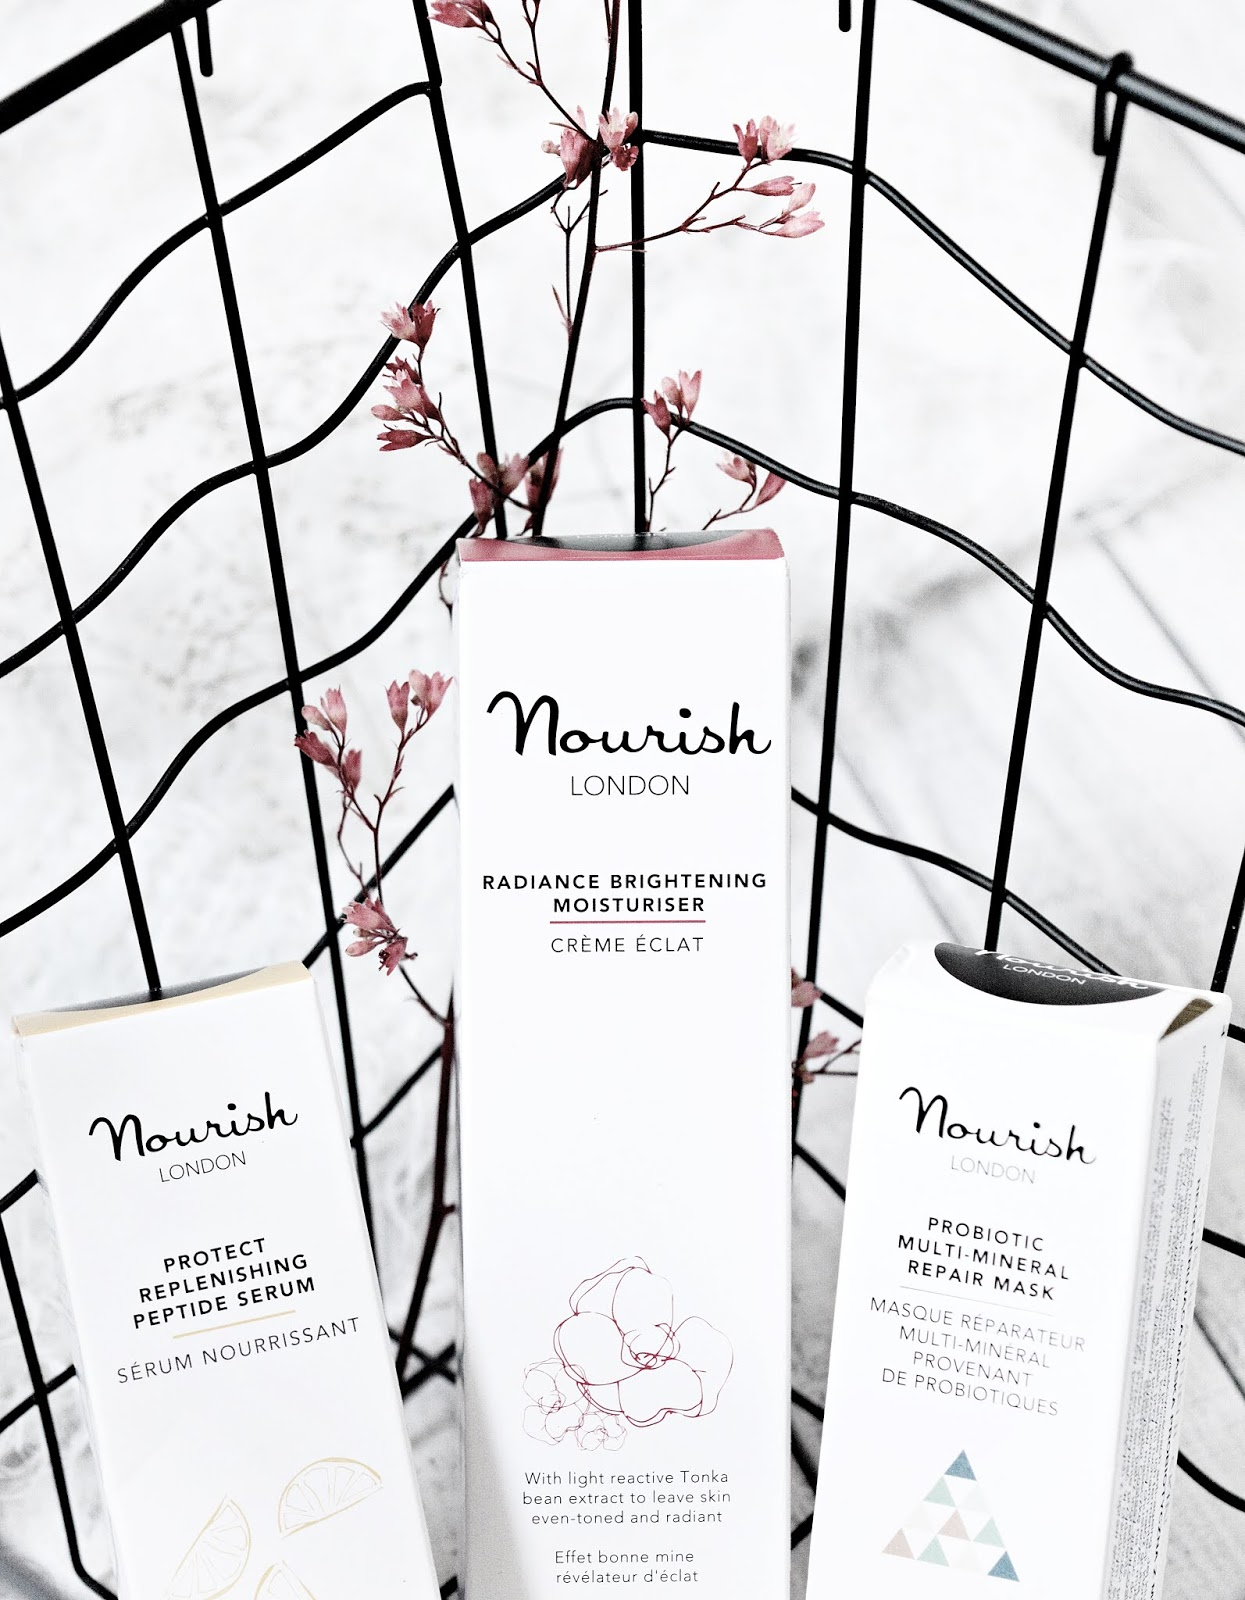 nourish cosmetics